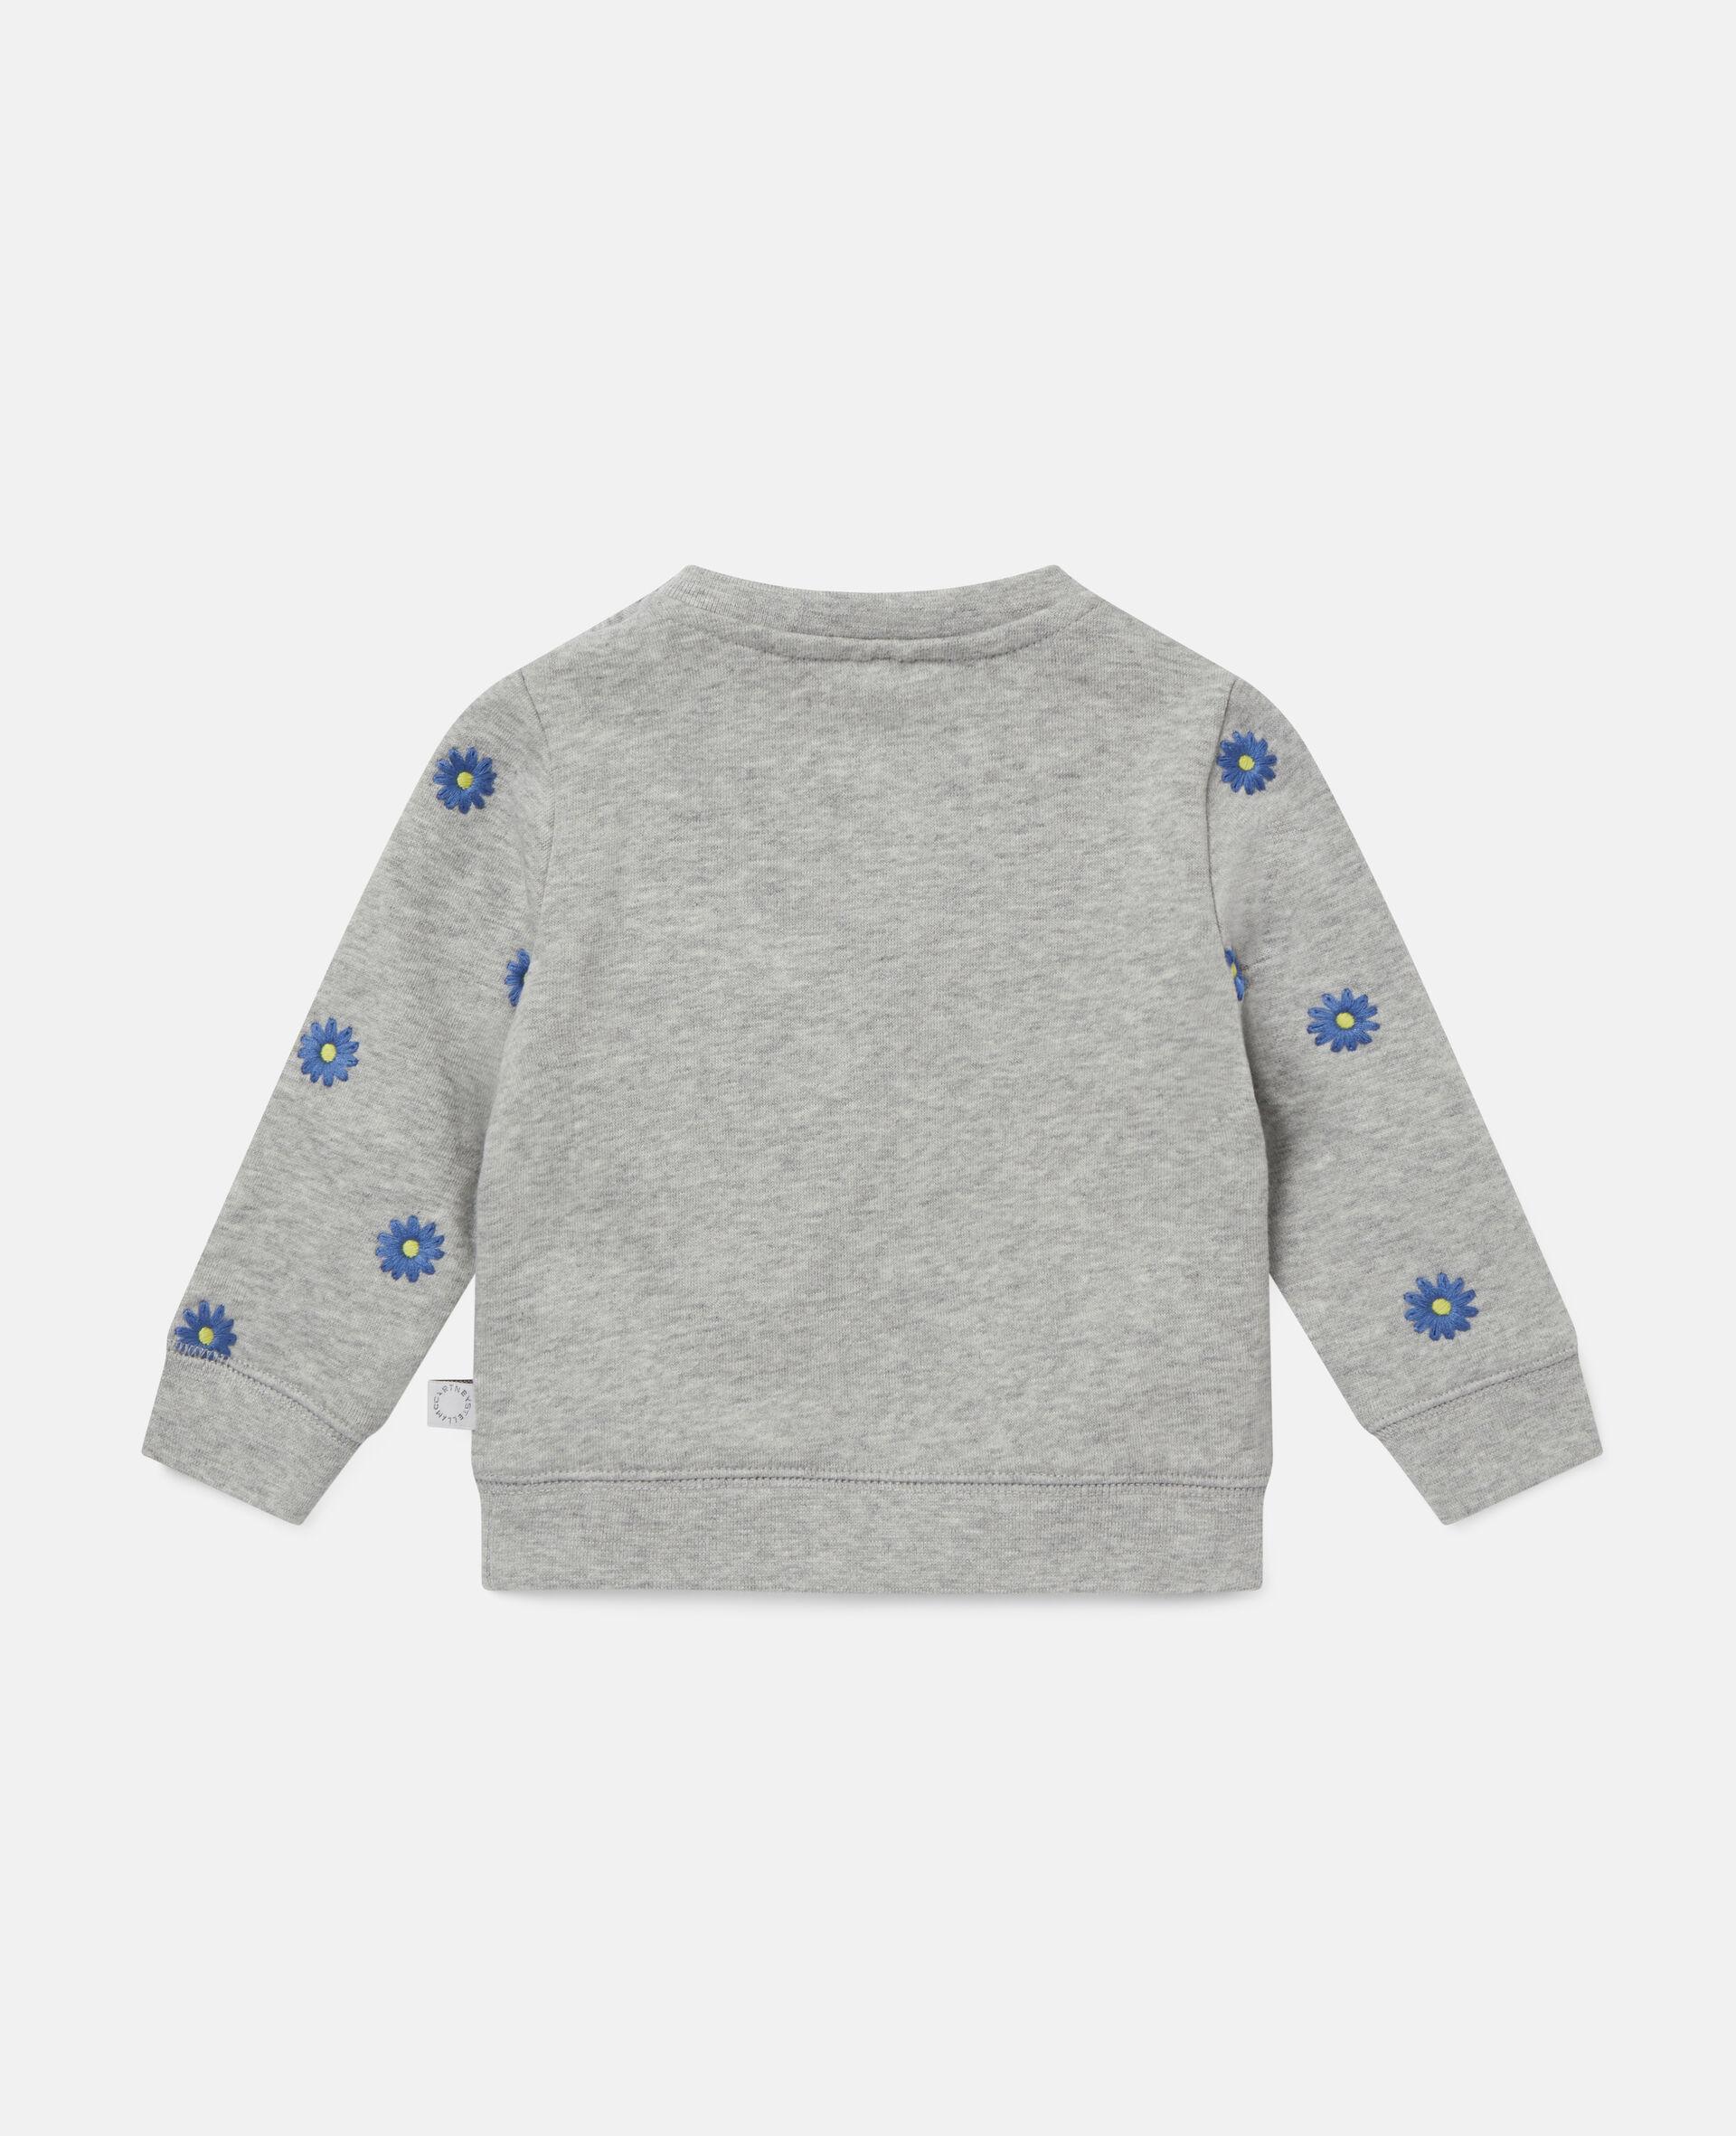 Embroidered Daisies Fleece Sweatshirt -Grey-large image number 3